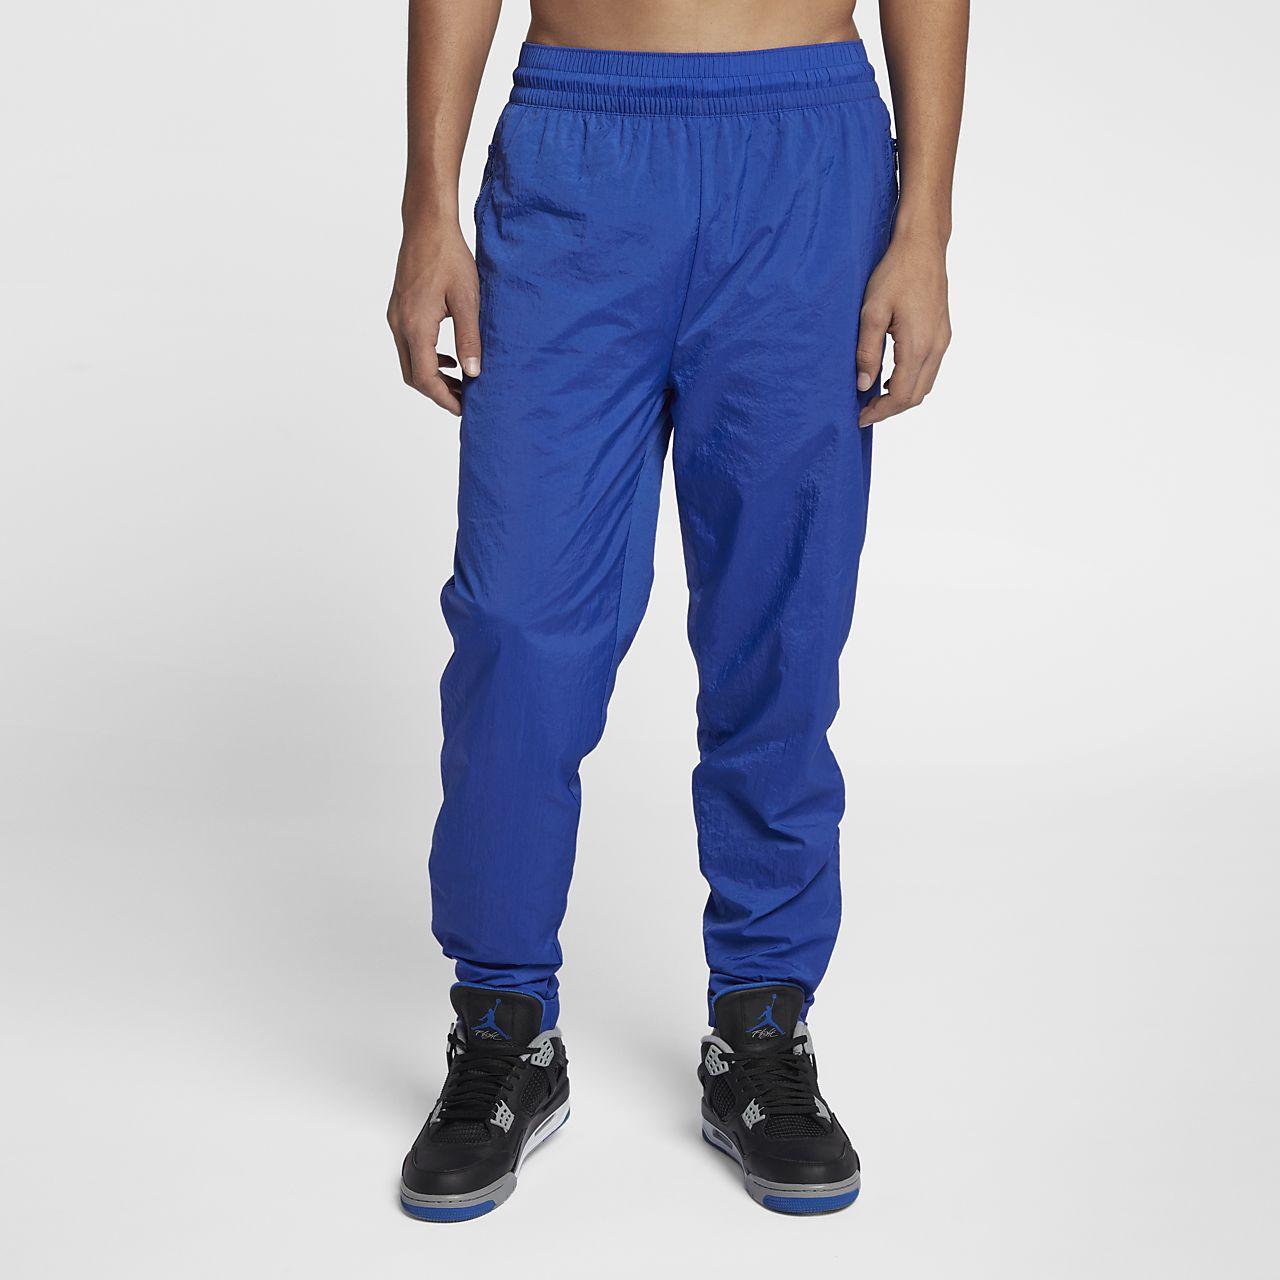 Jordan AJ 5 Vault 男子长裤